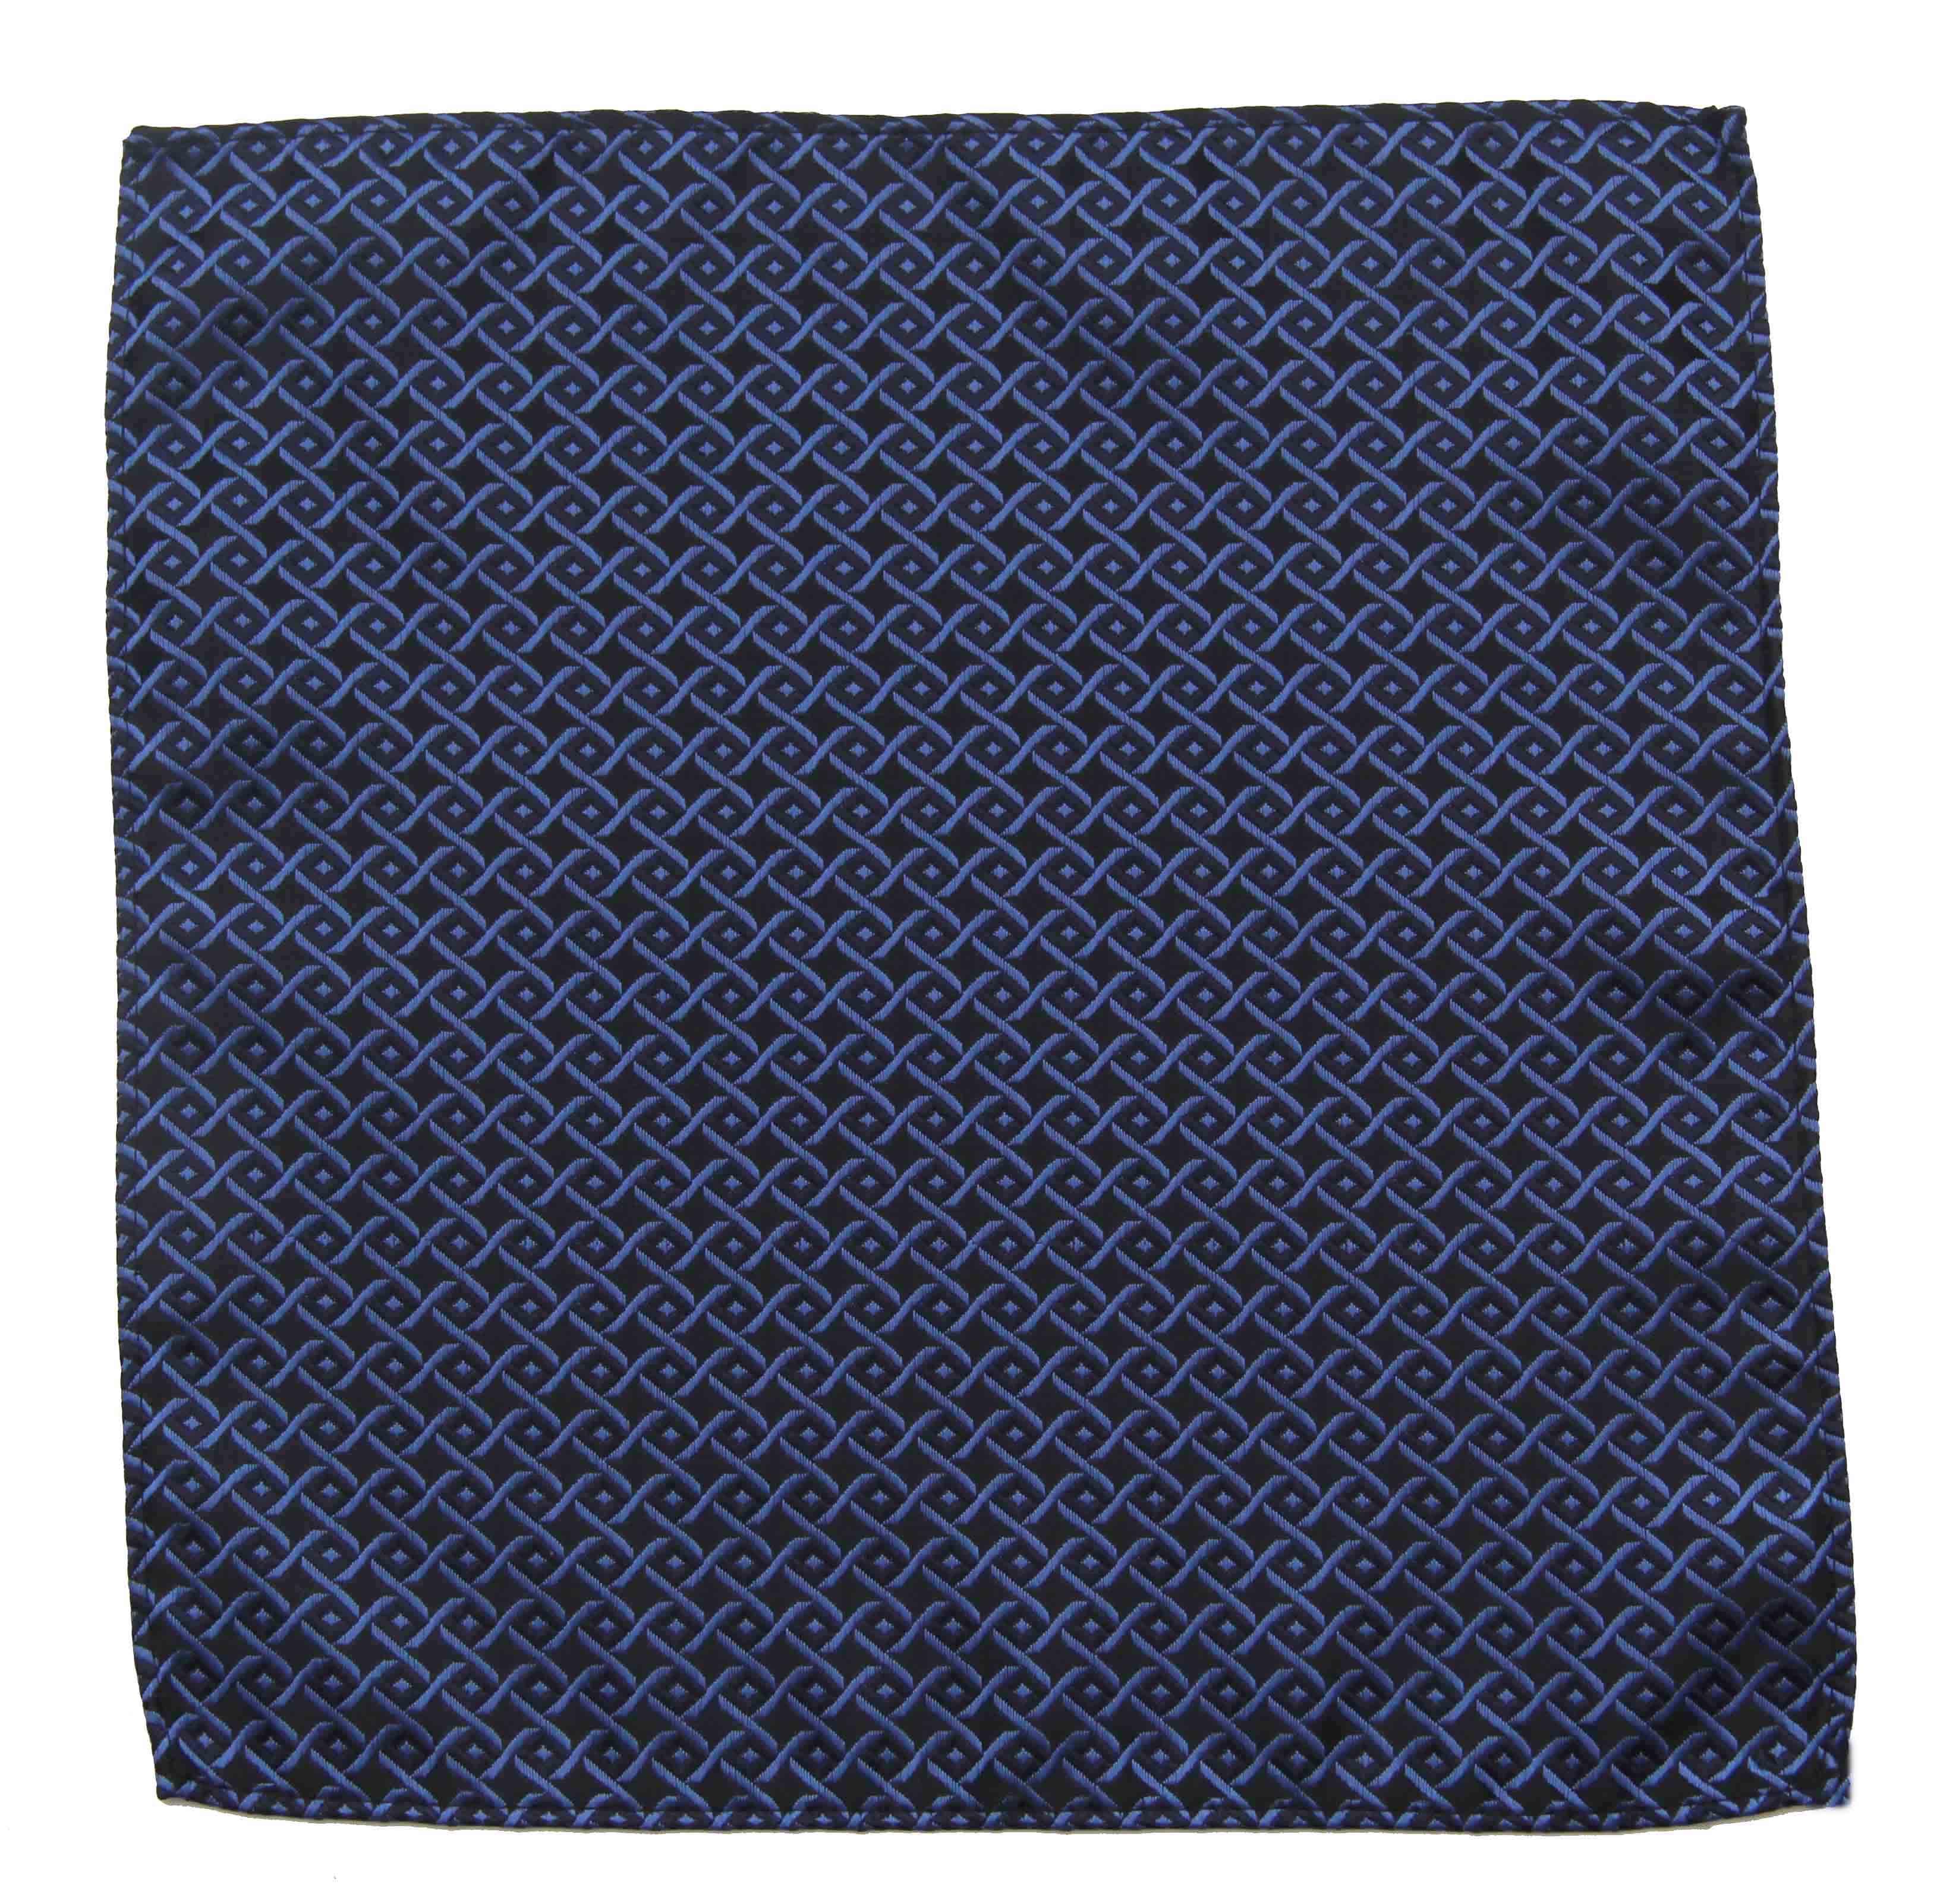 Gascoigne Silk Pocket Square Blue Black Interlocking Geometric Pattern Men's